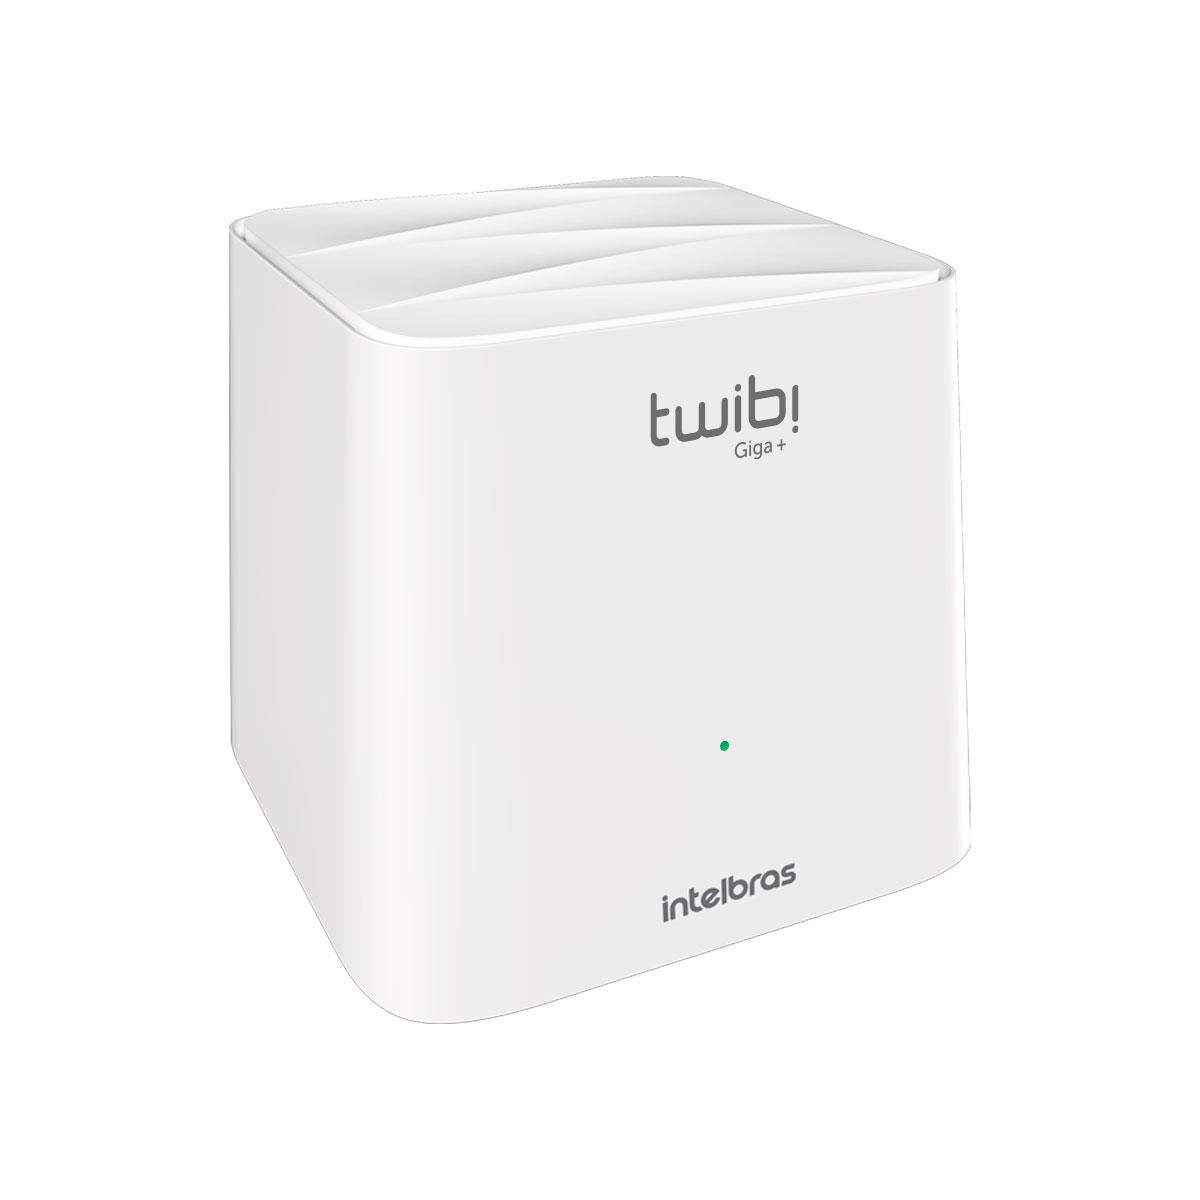 CONJUNTO ROTEADOR MESH TWIBI GIGA+ AC1200 DUAL BAND PACK C/2 4750079  - Audio Video & cia